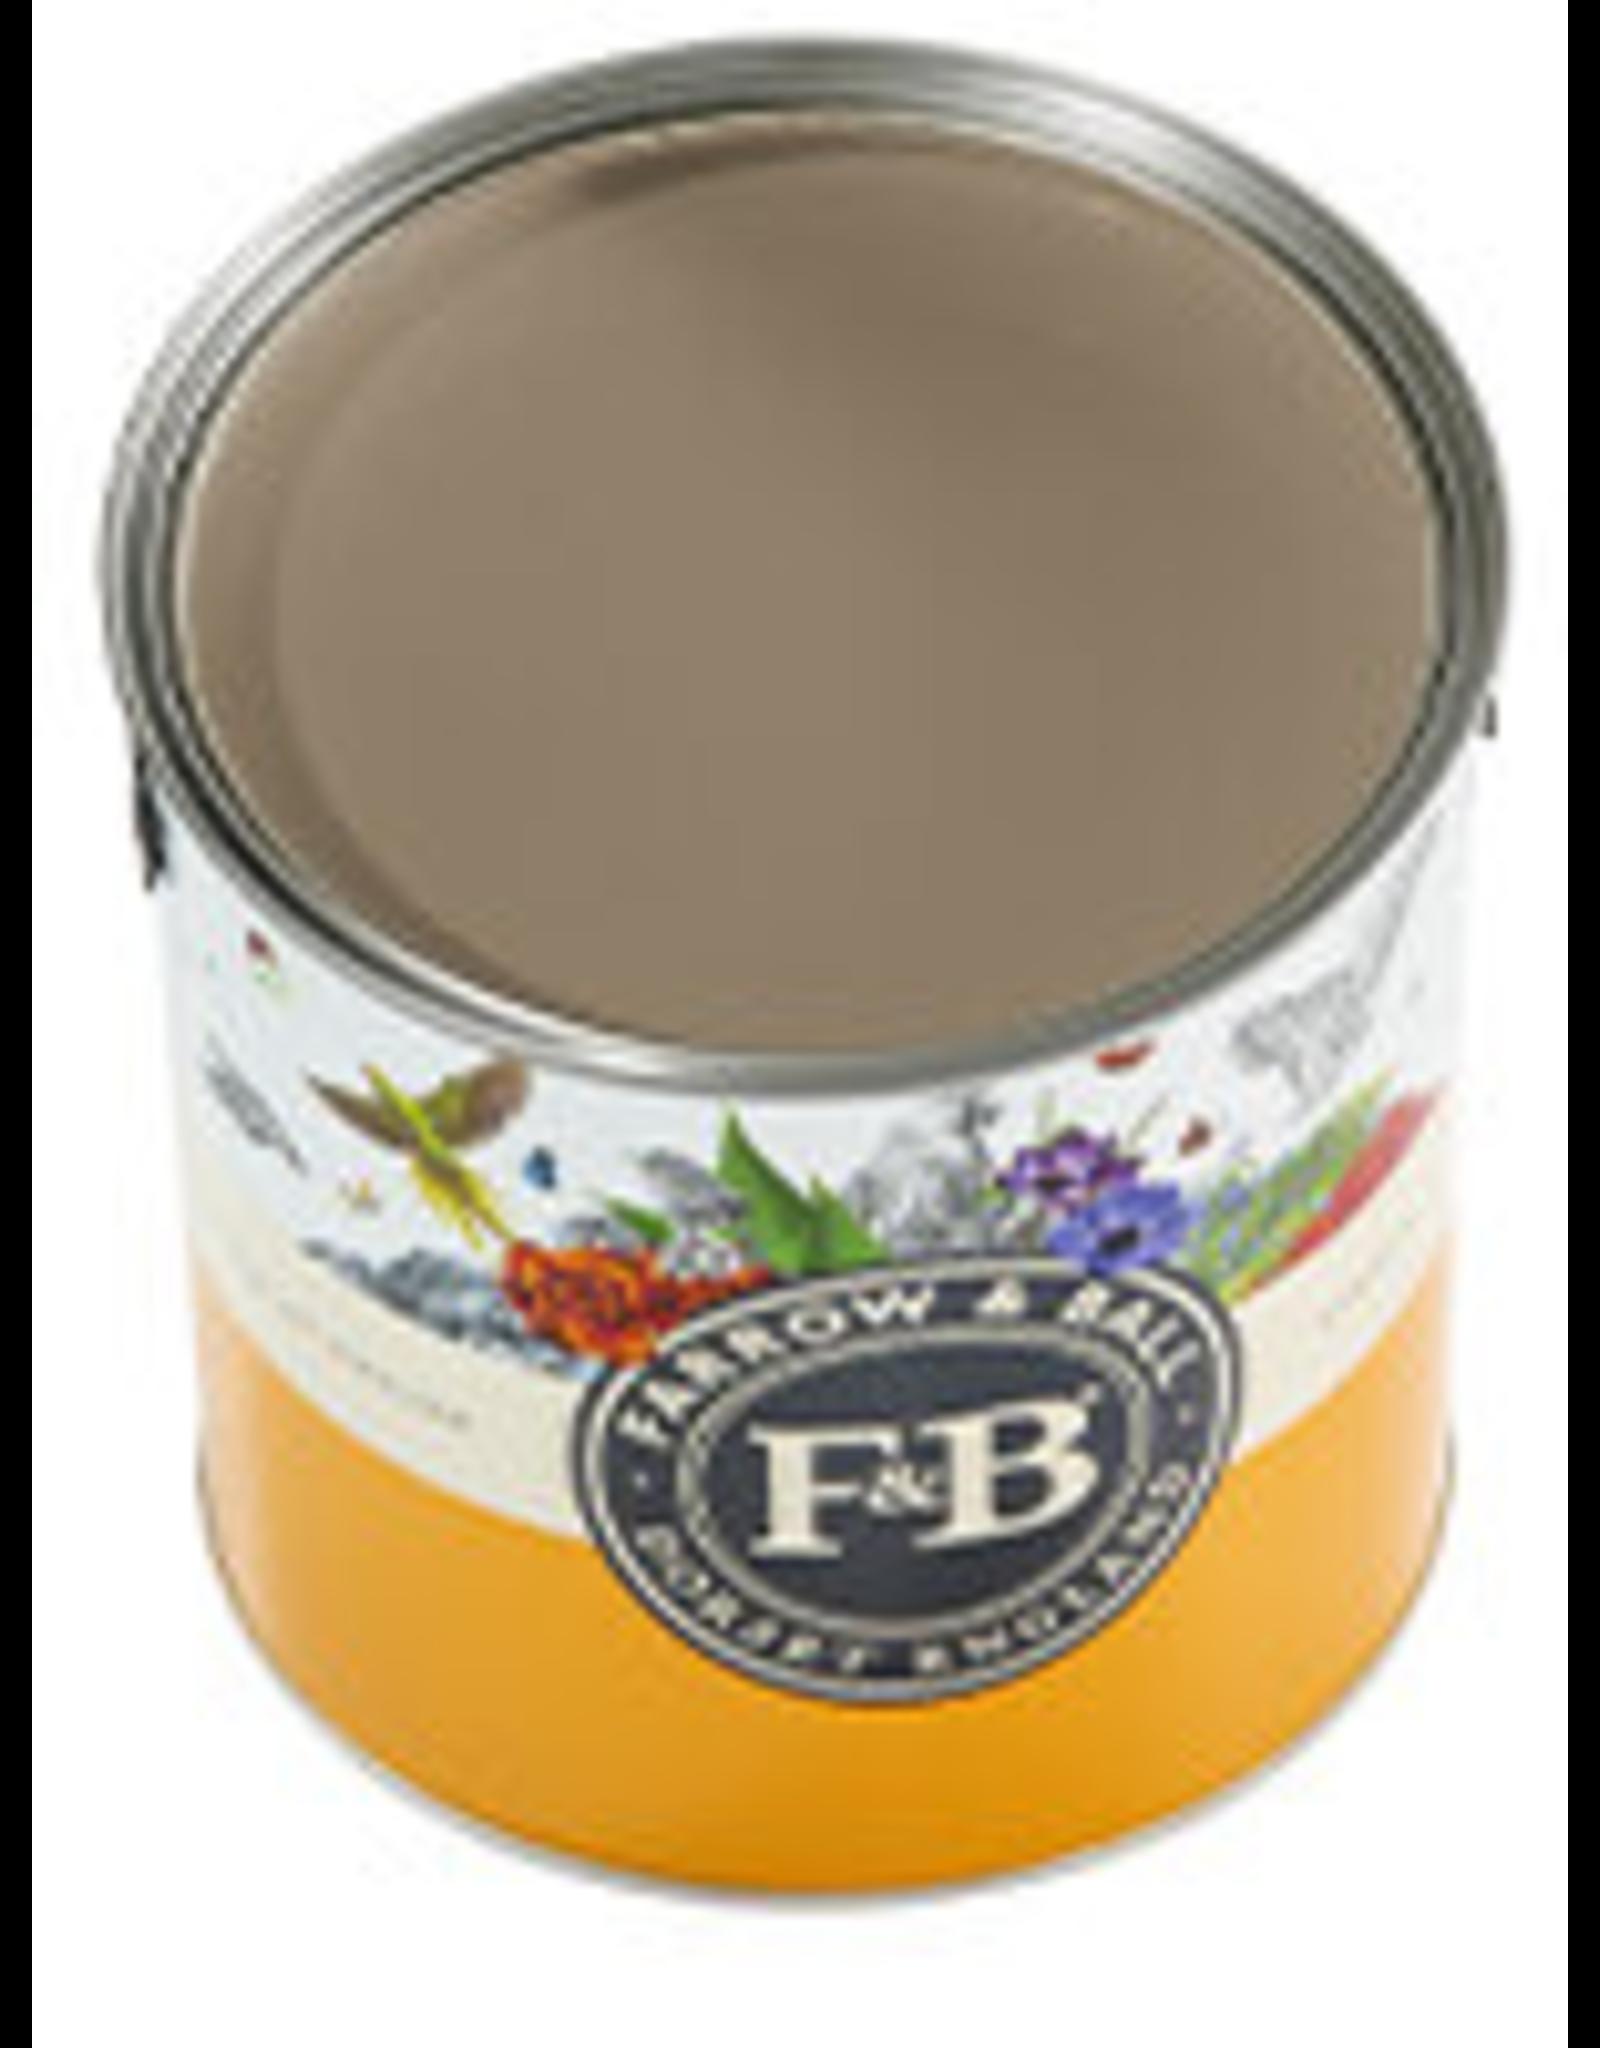 Farrow and Ball US Gallon Modern Emulsion NHM Broccoli Brown No.W108